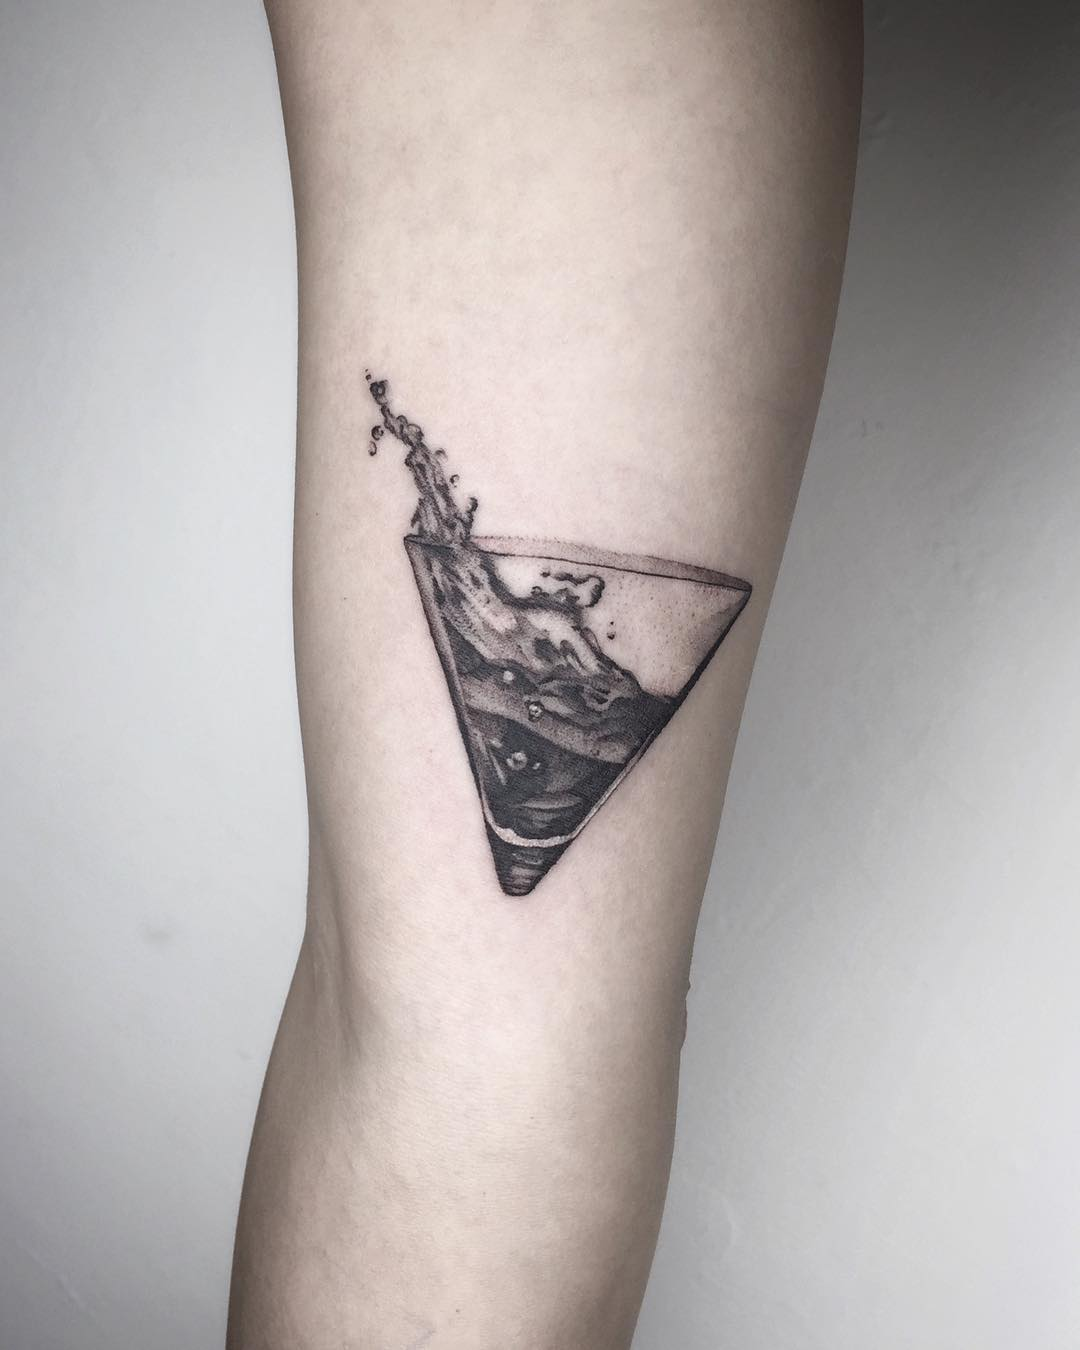 Dry Martini tattoo by Choco Chiang